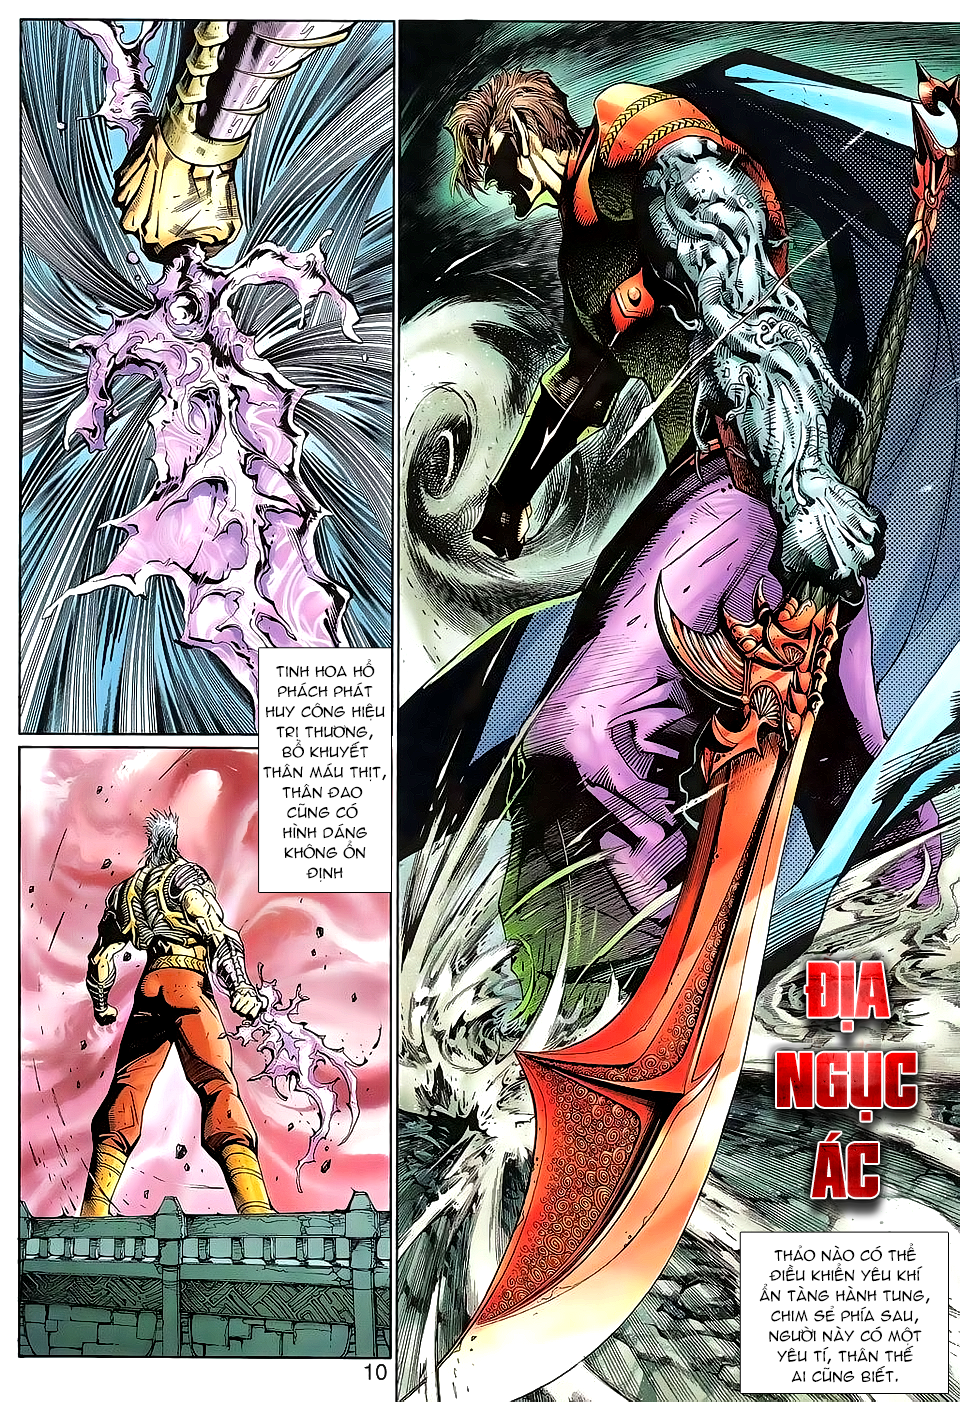 Thần binh huyền kỳ 3 - 3.5 Chapter 95 - Hamtruyen.vn